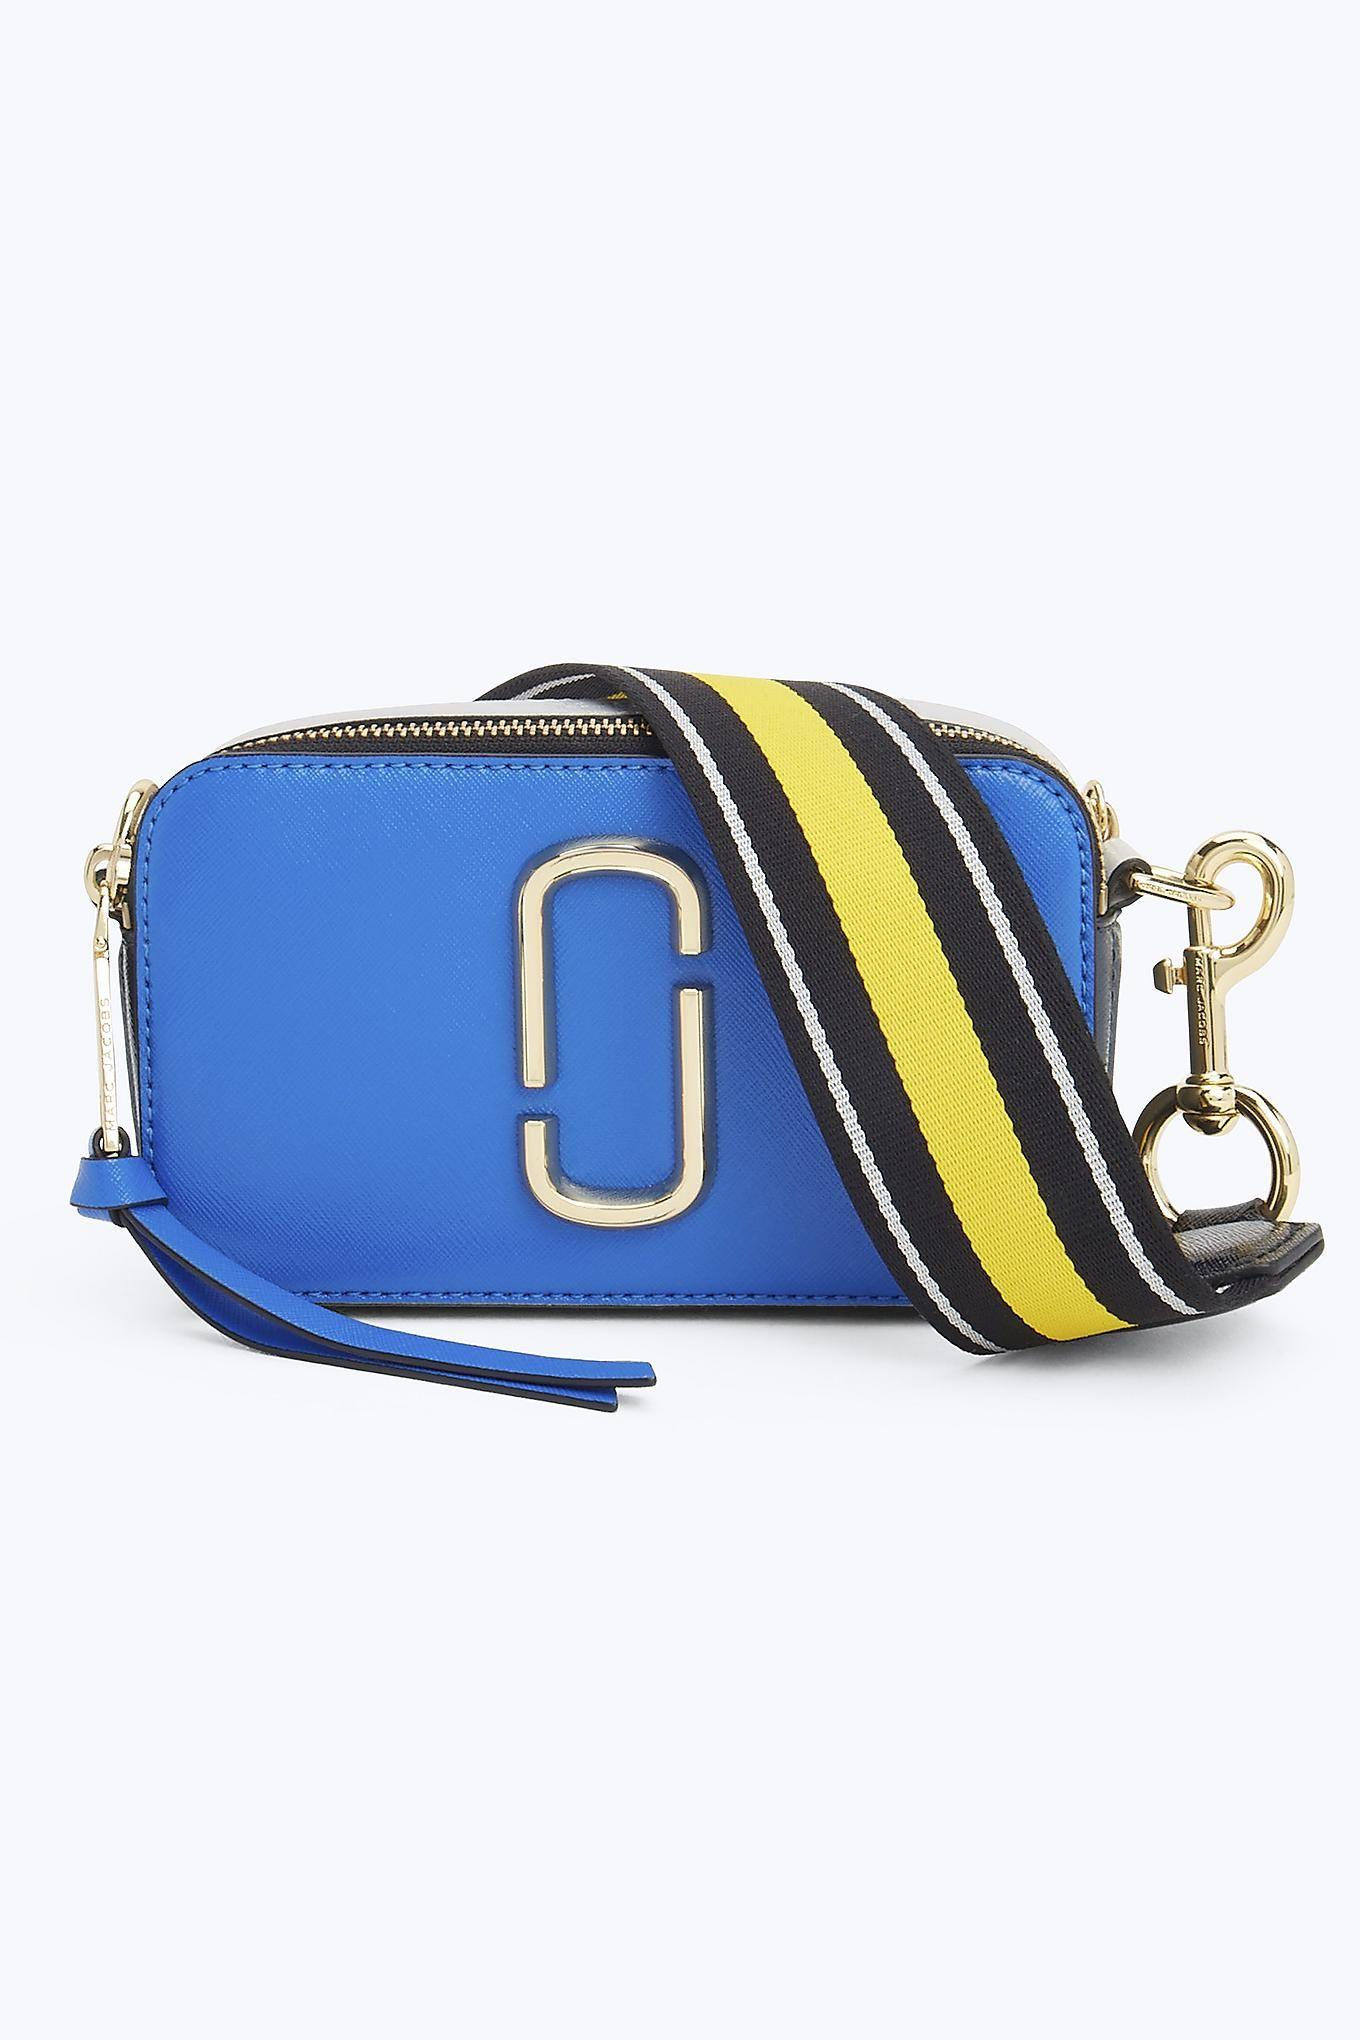 0b4c7be434a8 Snapshot Small Camera Bag- Dazzling Blue Multi